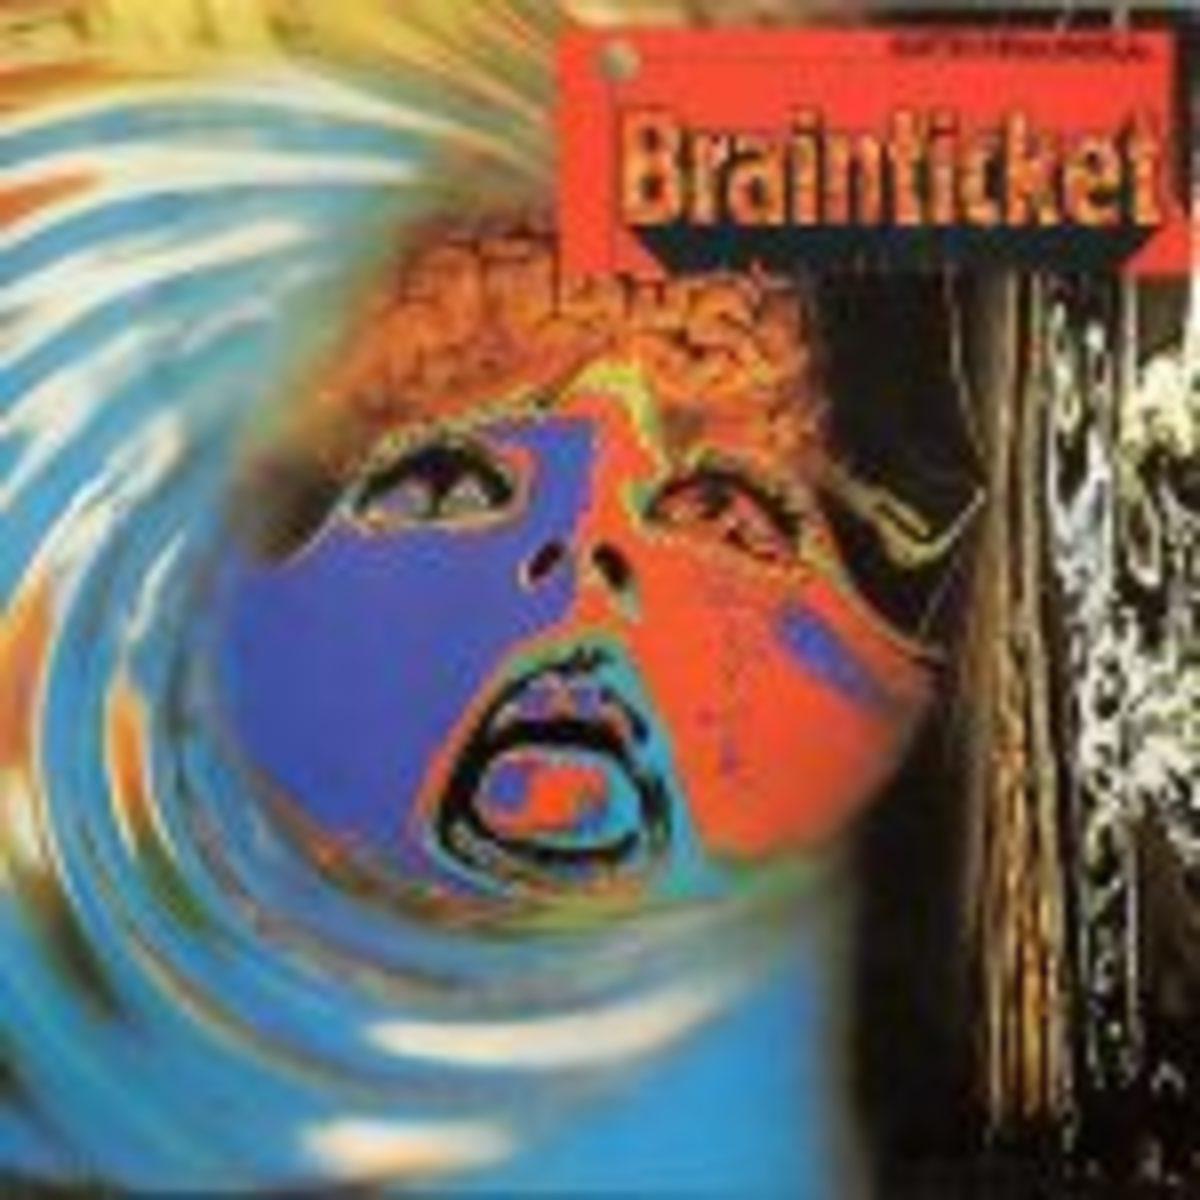 brain-ticket-cottonwoodhill